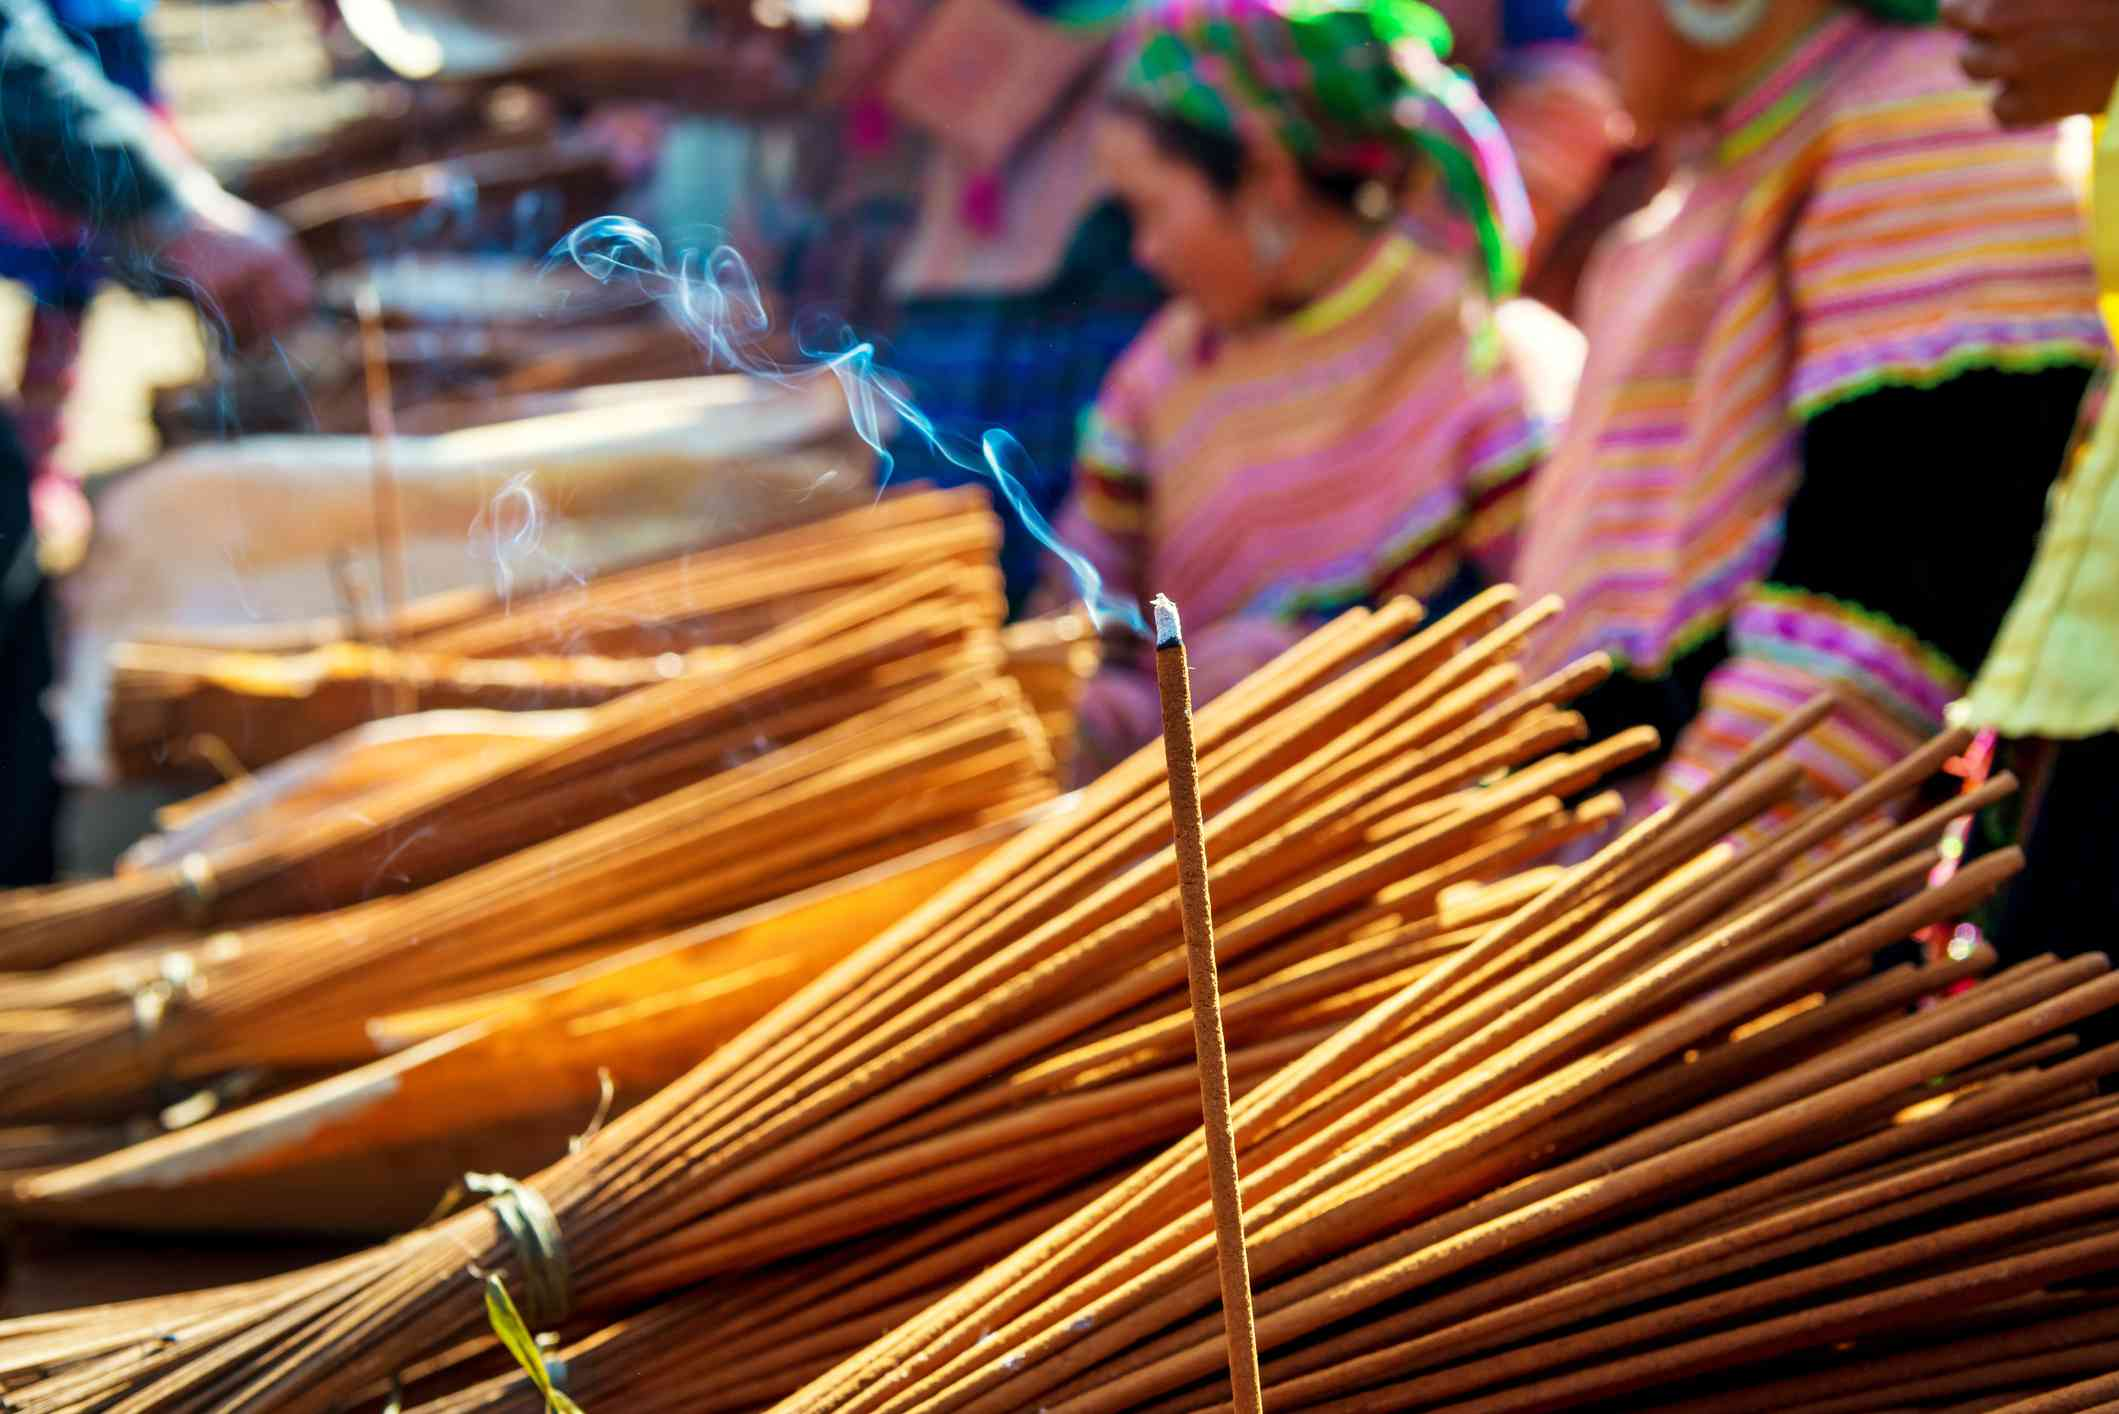 Joss sticks for sale at Bac Ha Market, Sapa, Vietnam